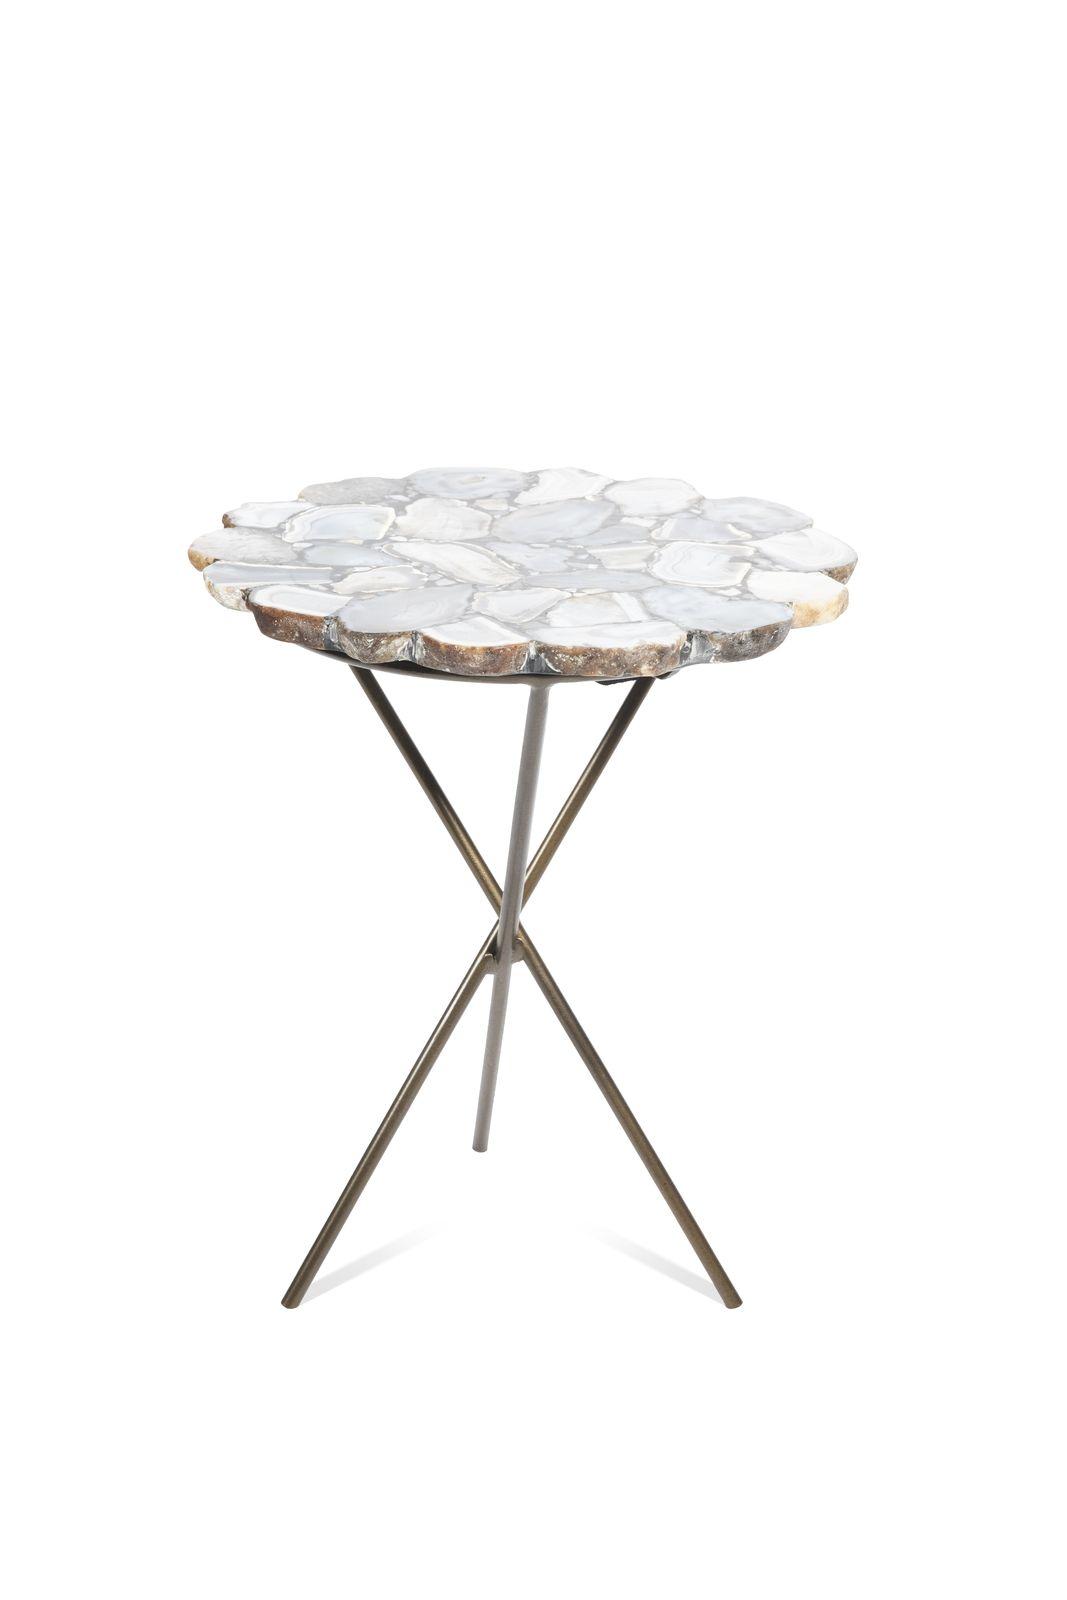 Приставной столик Mystical Agate 0.5x0.4x0.4м